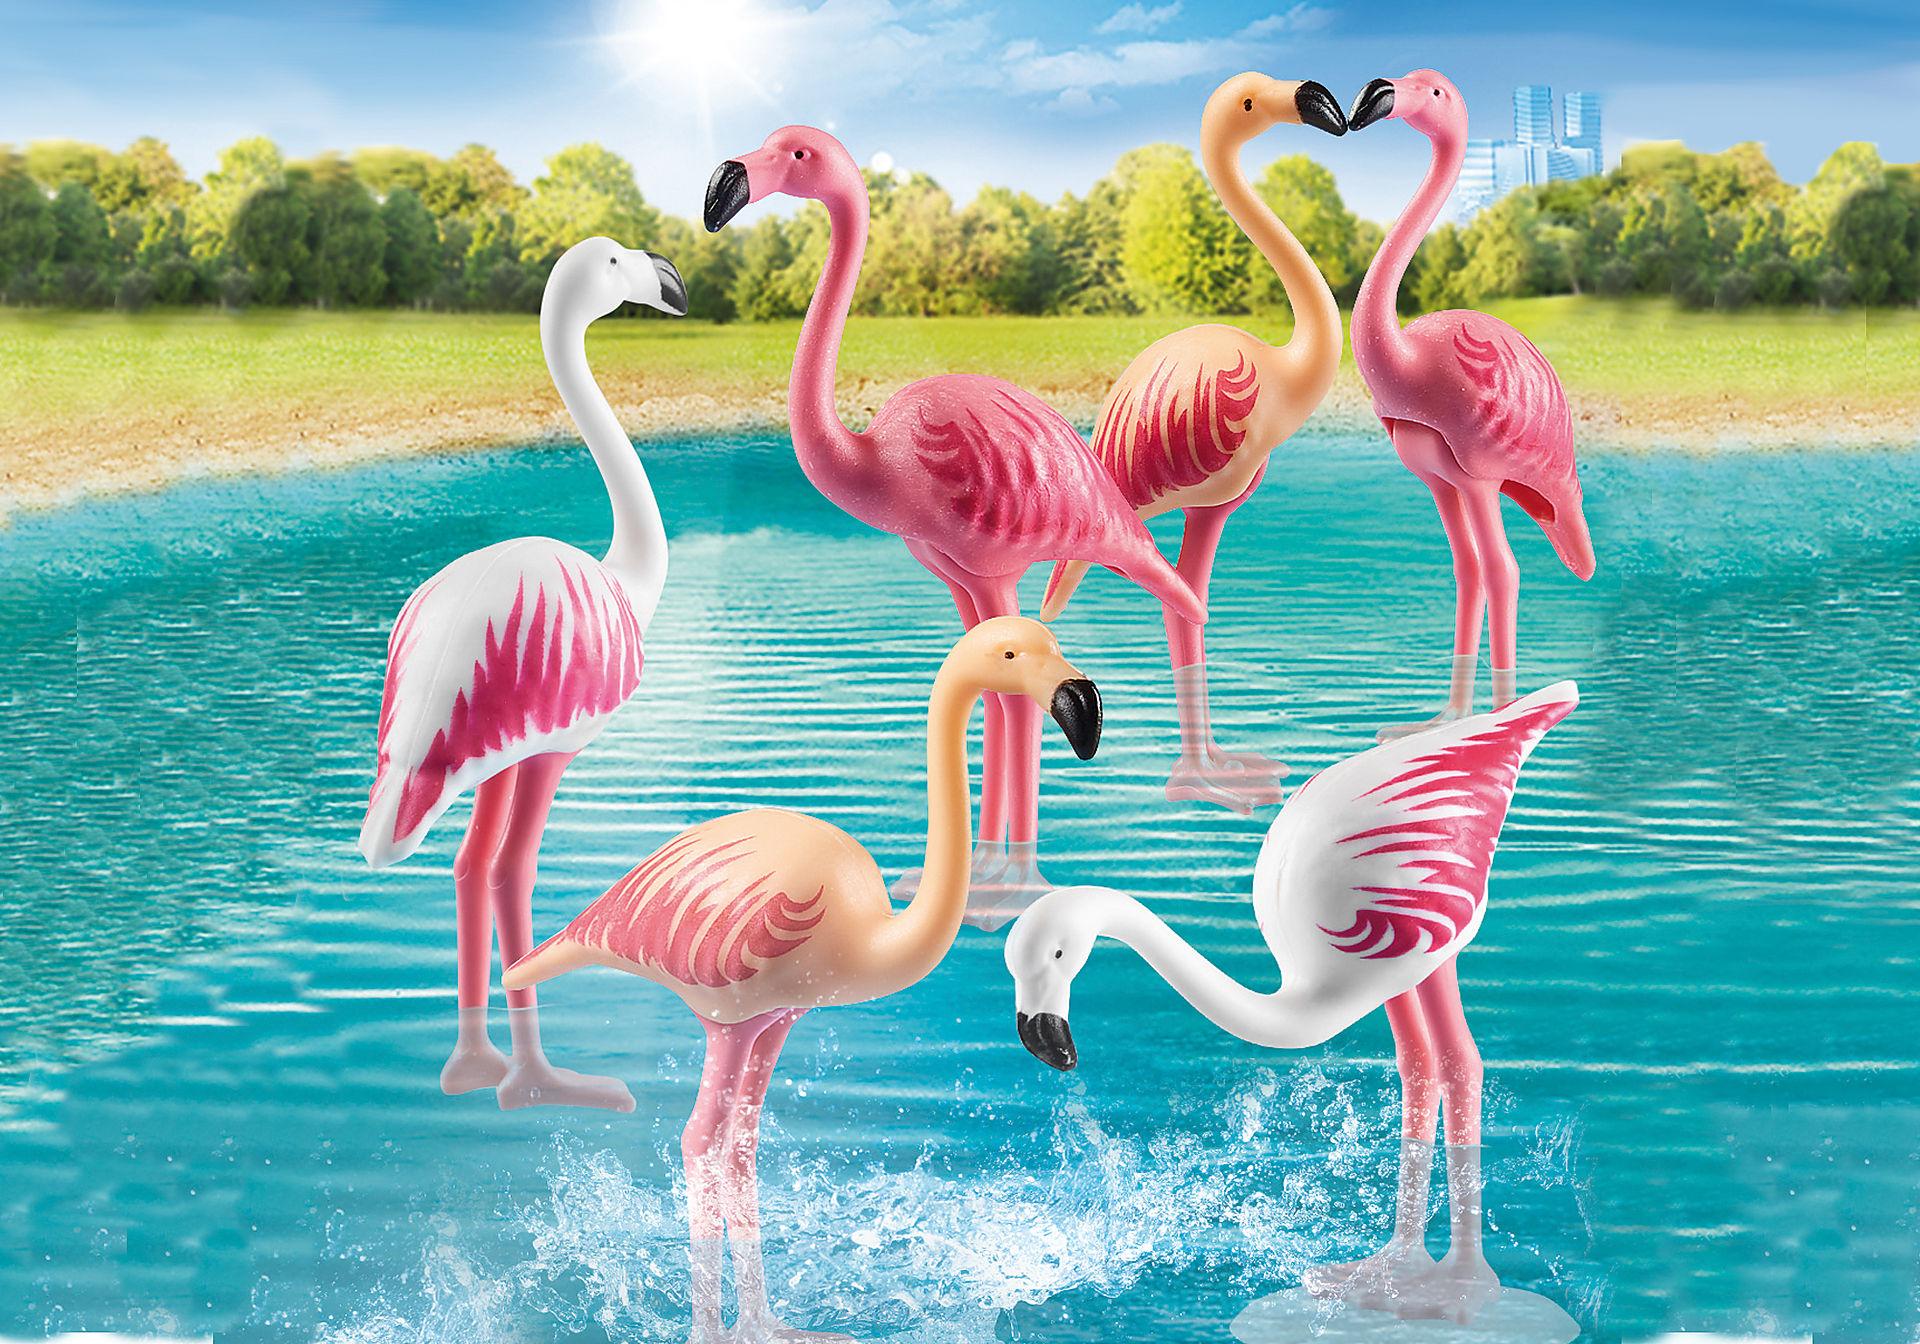 70351 Flamingoes (Bag) zoom image1